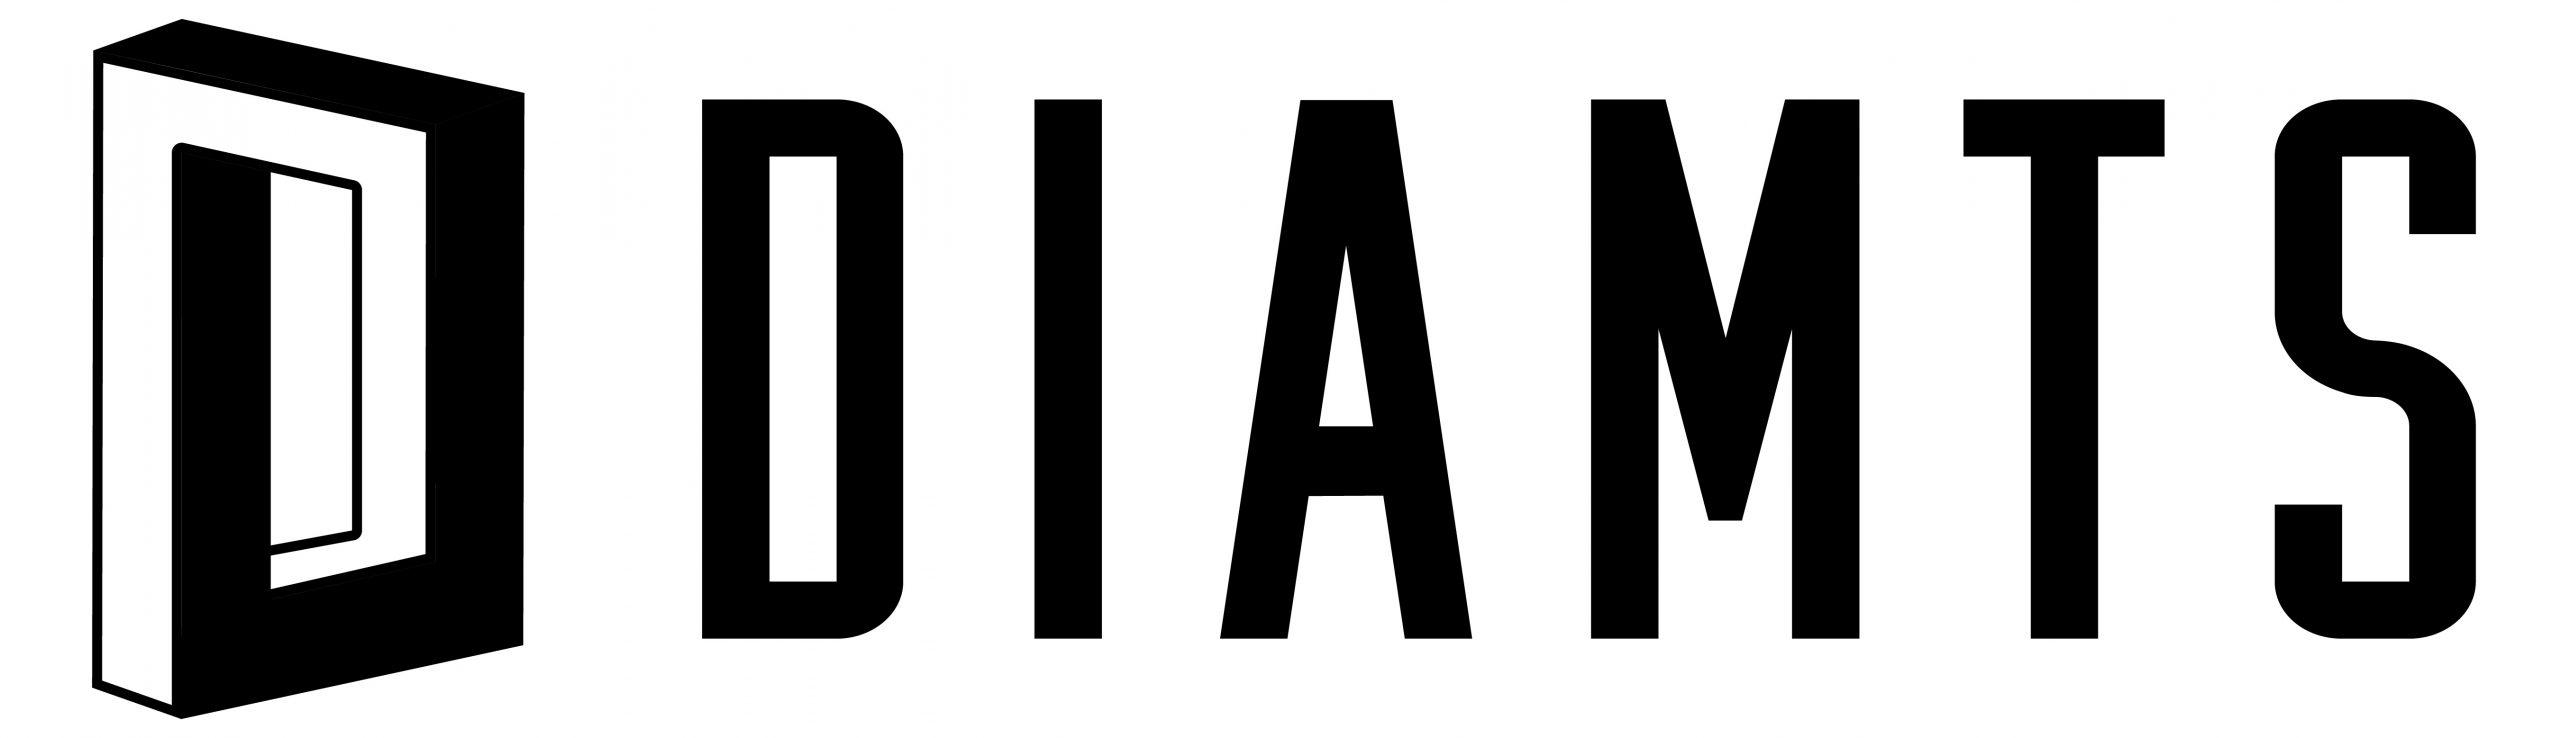 Detroit International Advanced Manufacturing Technology Show(DIAMTS) Logo